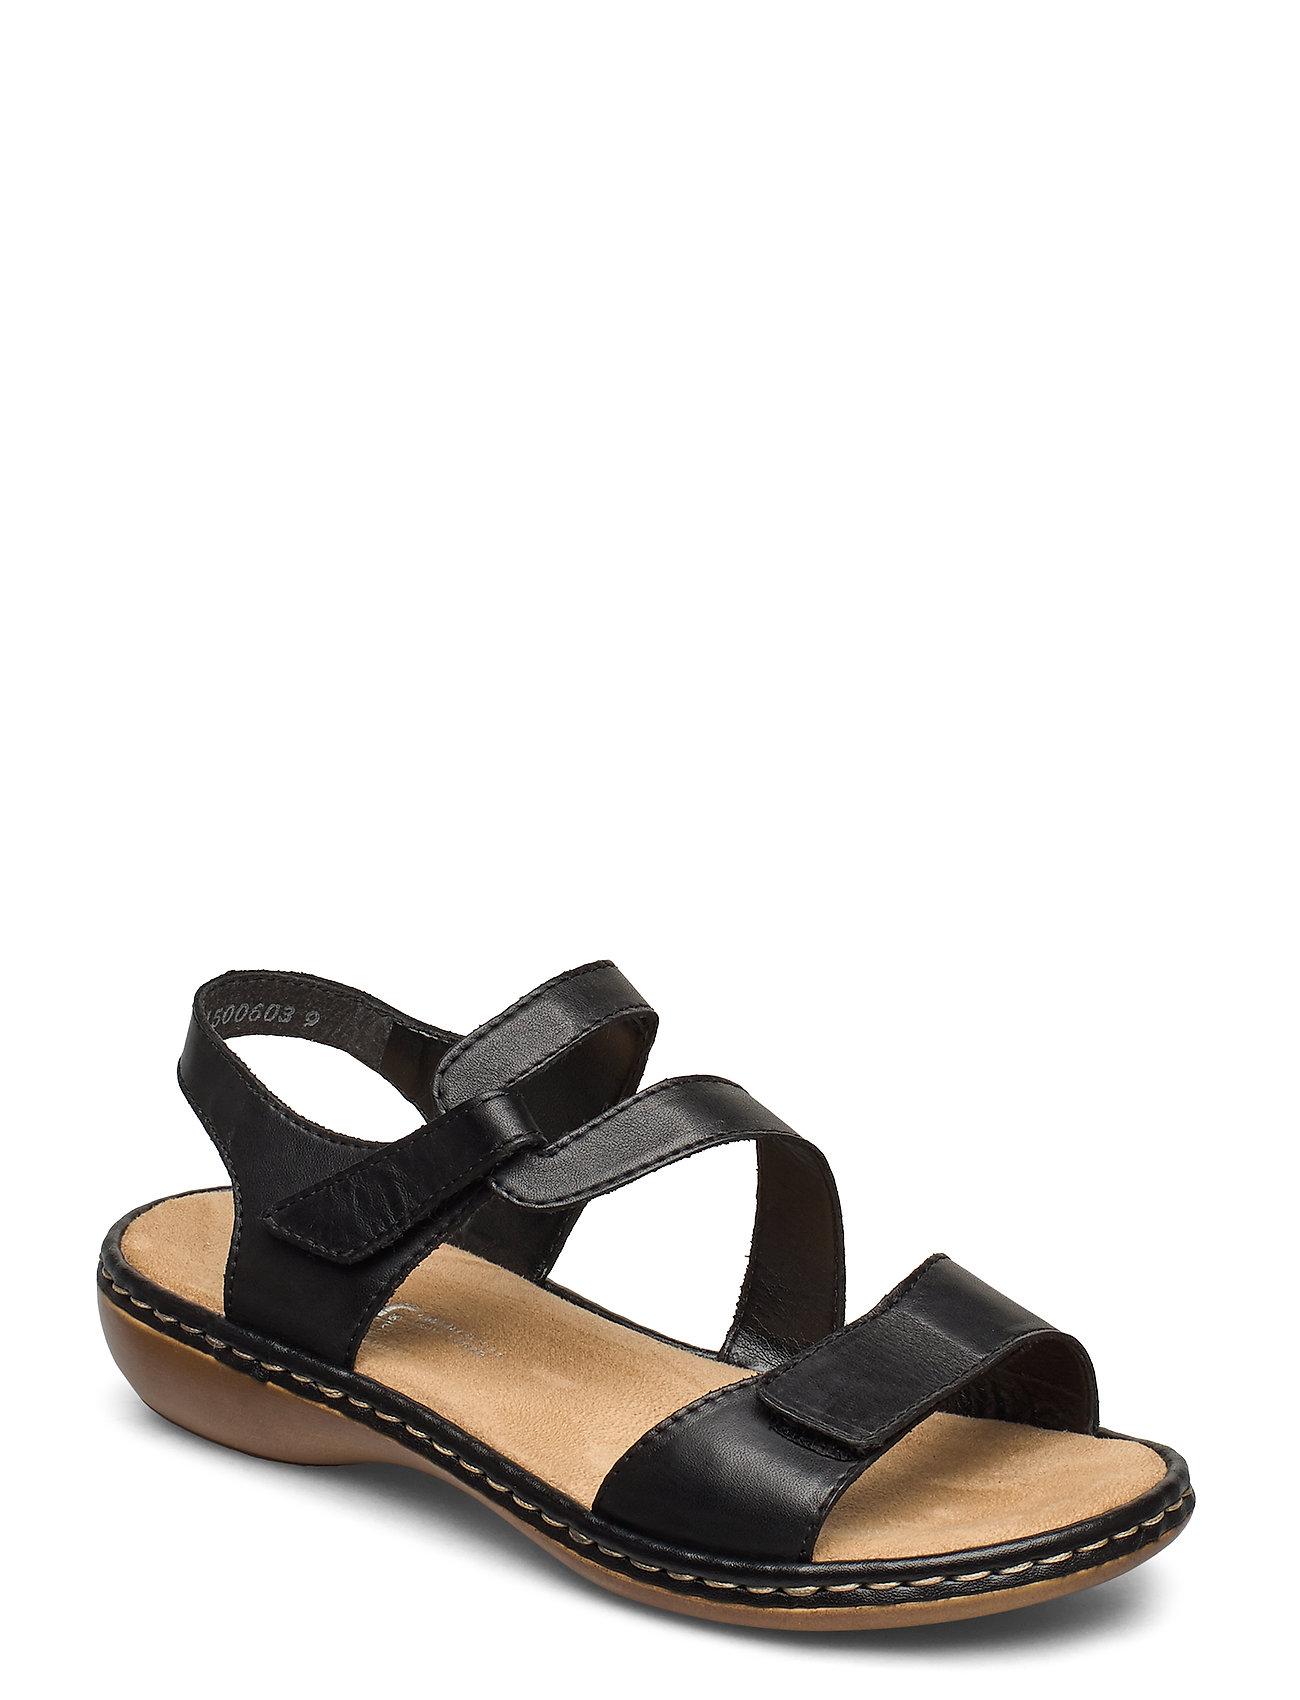 Image of 659c7-00 Shoes Summer Shoes Flat Sandals Sort Rieker (3493868113)